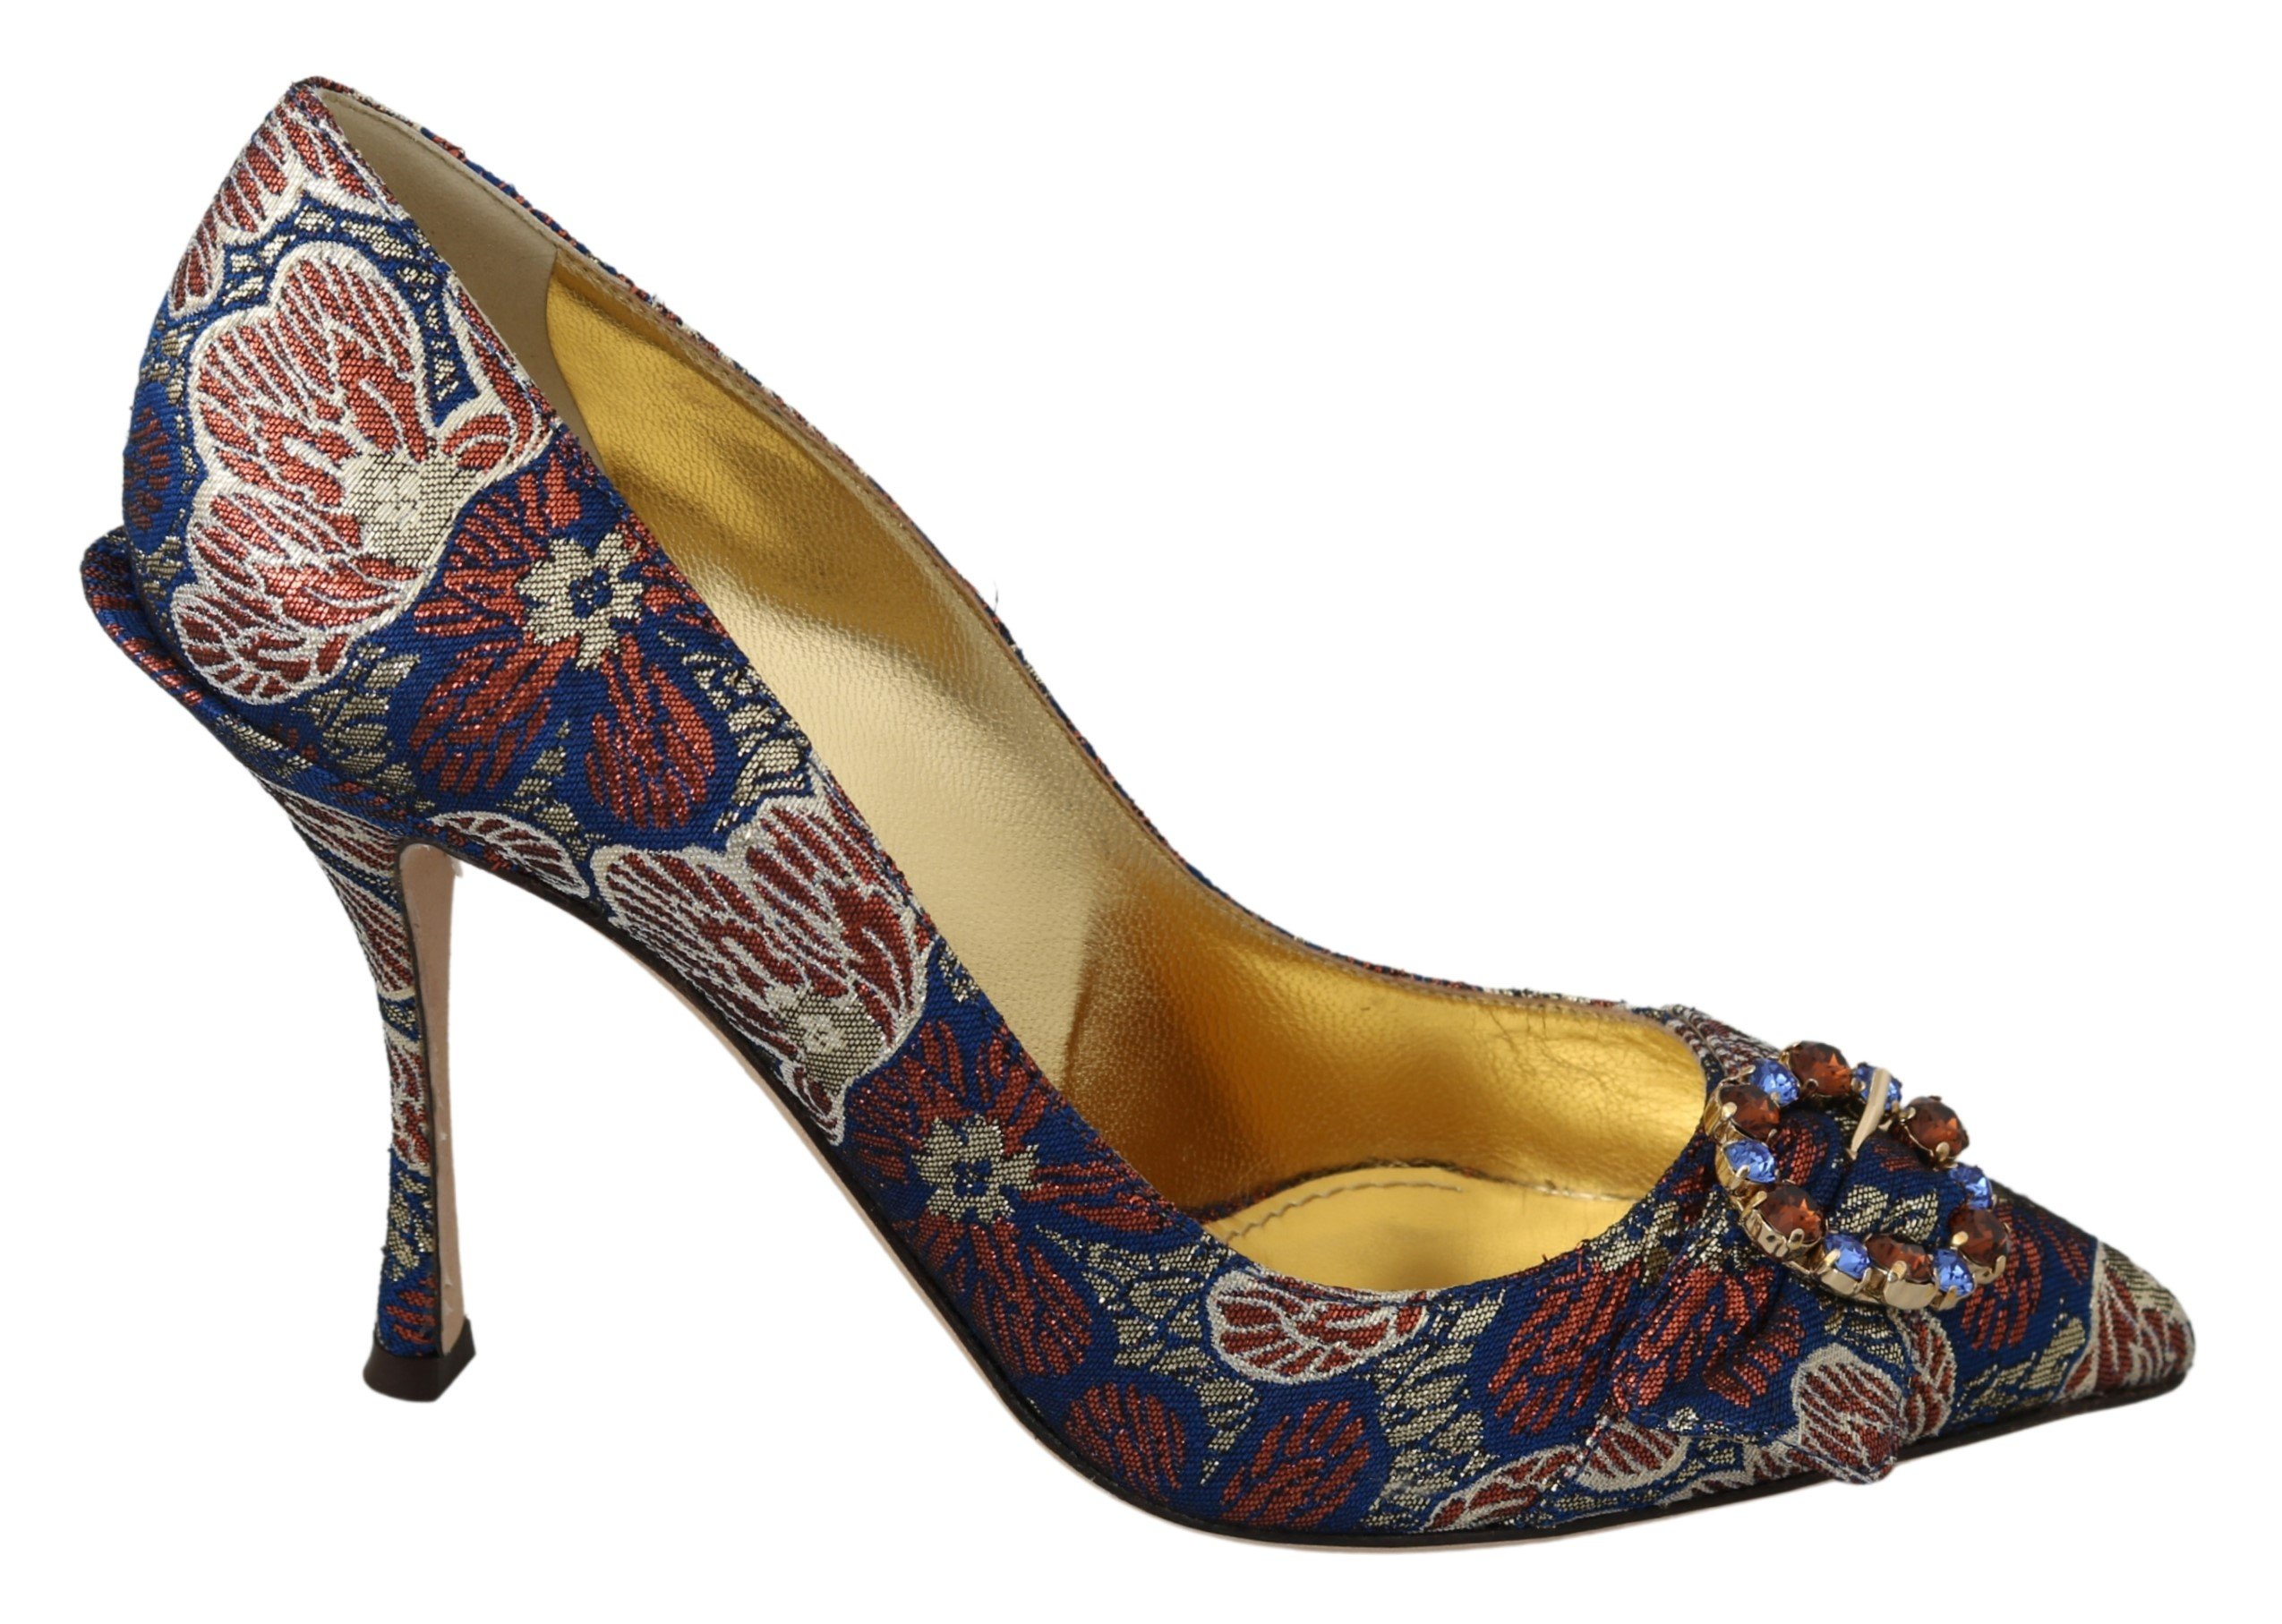 Dolce & Gabbana Women's Crystal Jacquard High Heel Pumps Blue LA7035 - EU39/US8.5